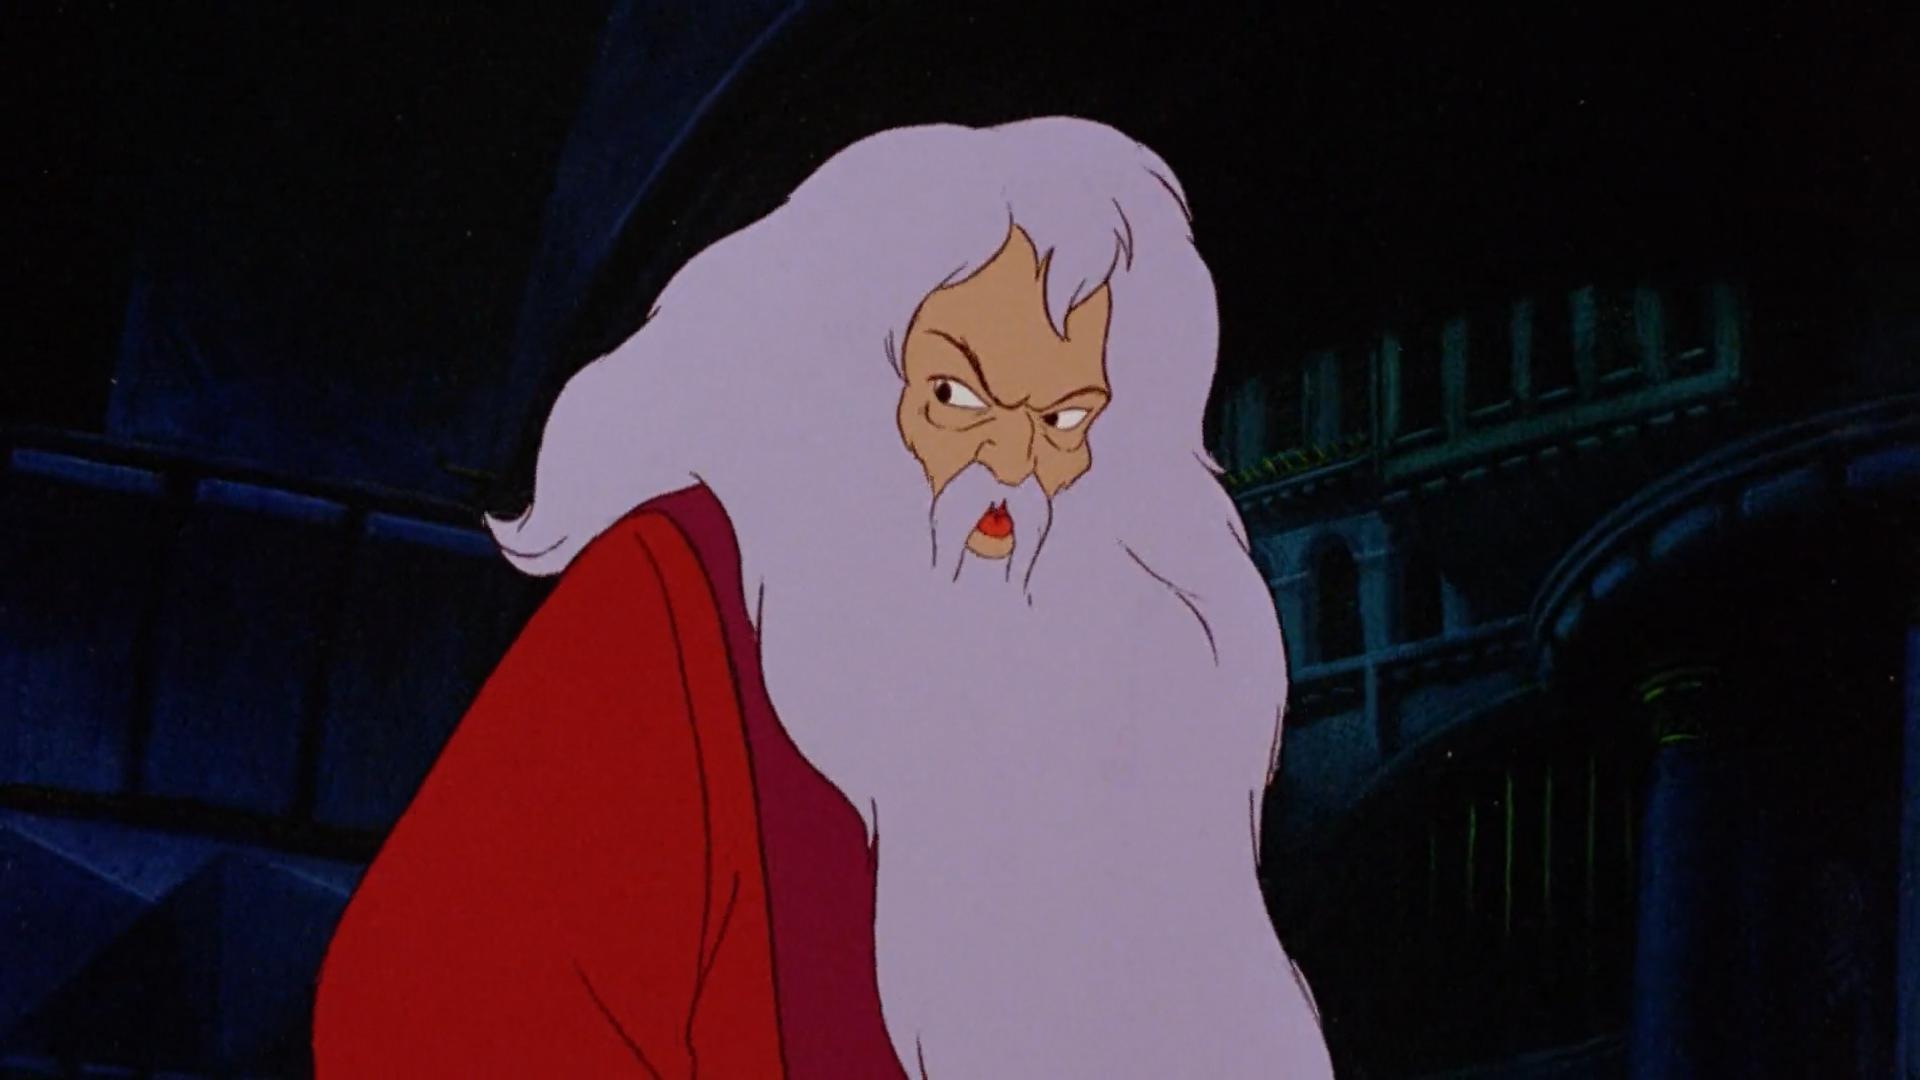 File:Saruman.png